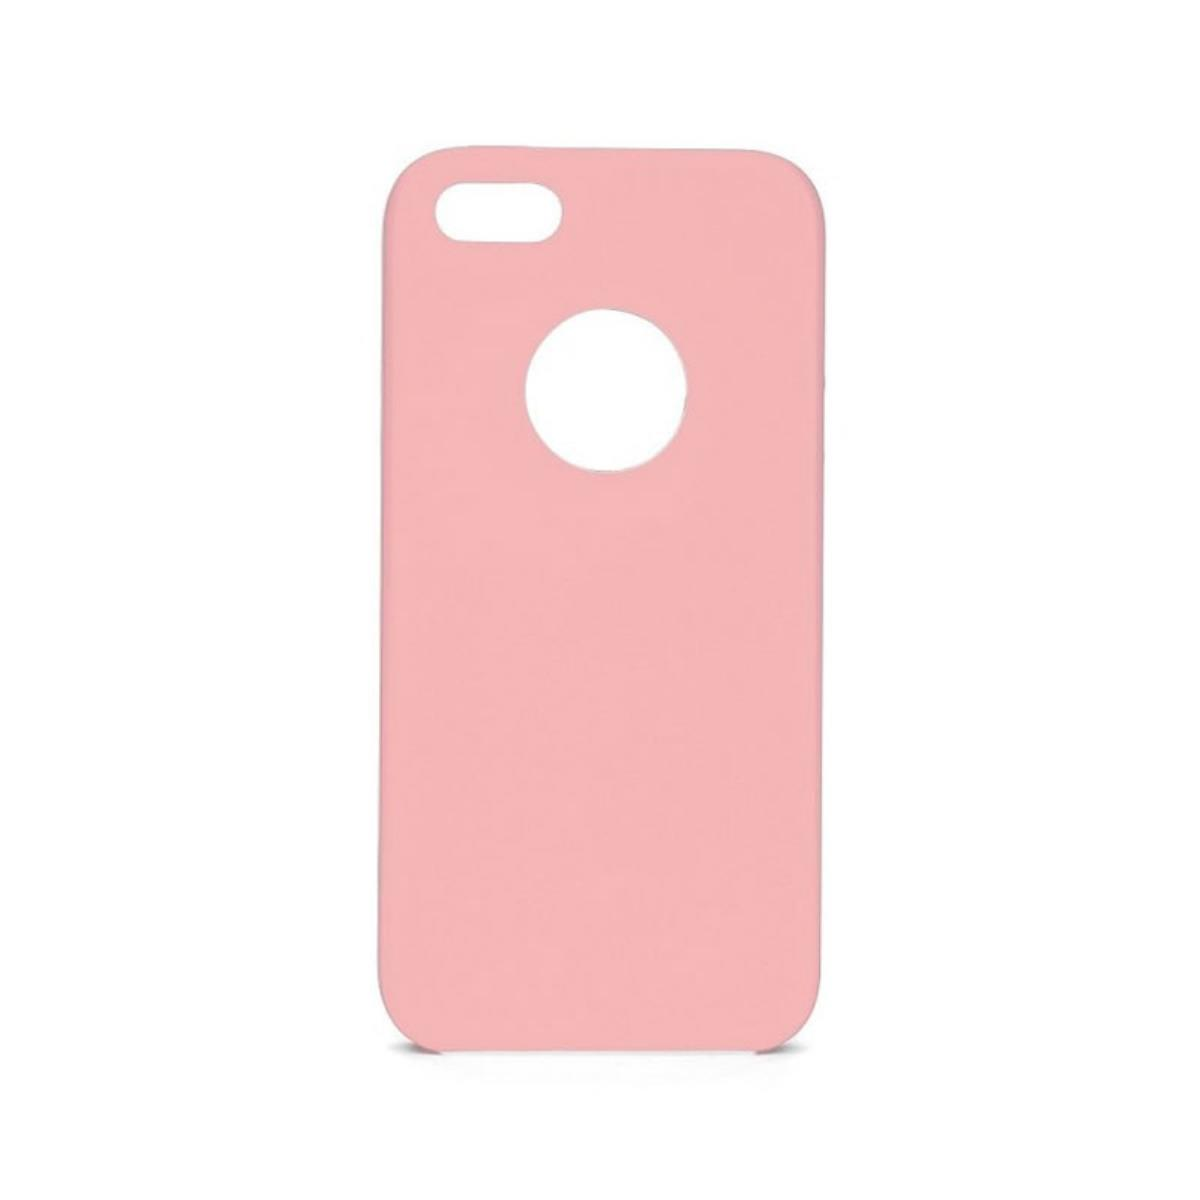 099bb994bb4 Compre online Funda Silicona Premium iPhone 5S/SE Rosa